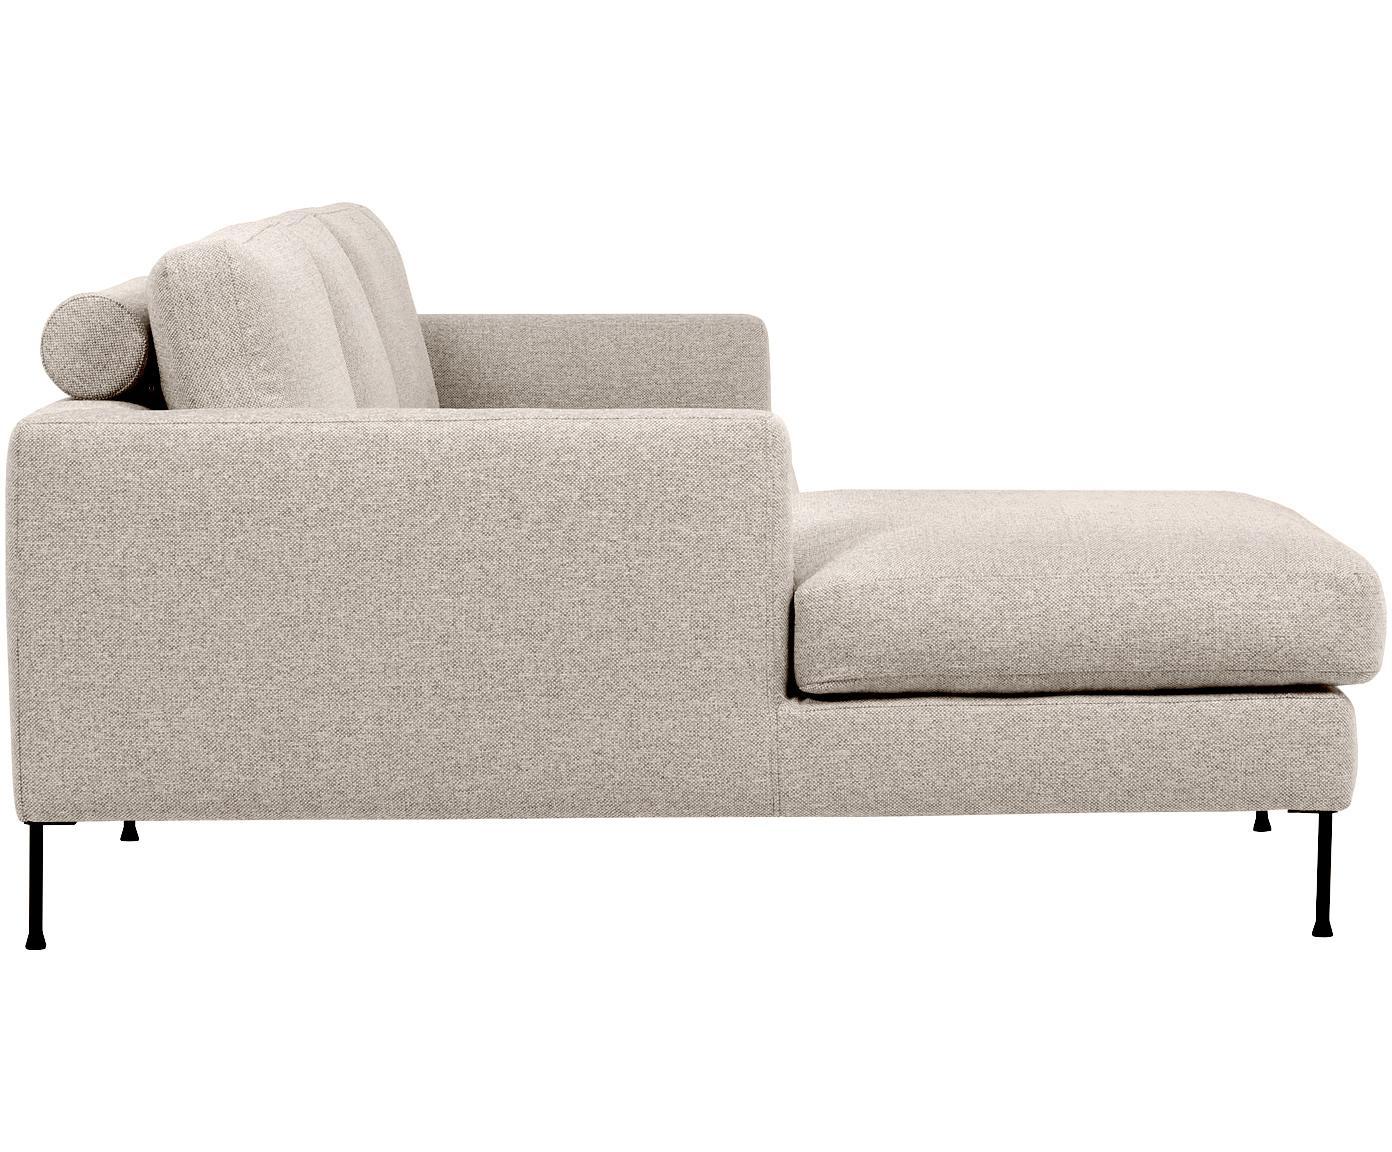 Ecksofa Cucita (3-Sitzer), Bezug: Webstoff (Polyester) 100., Gestell: Massives Kiefernholz, Webstoff Beige, B 262 x T 163 cm